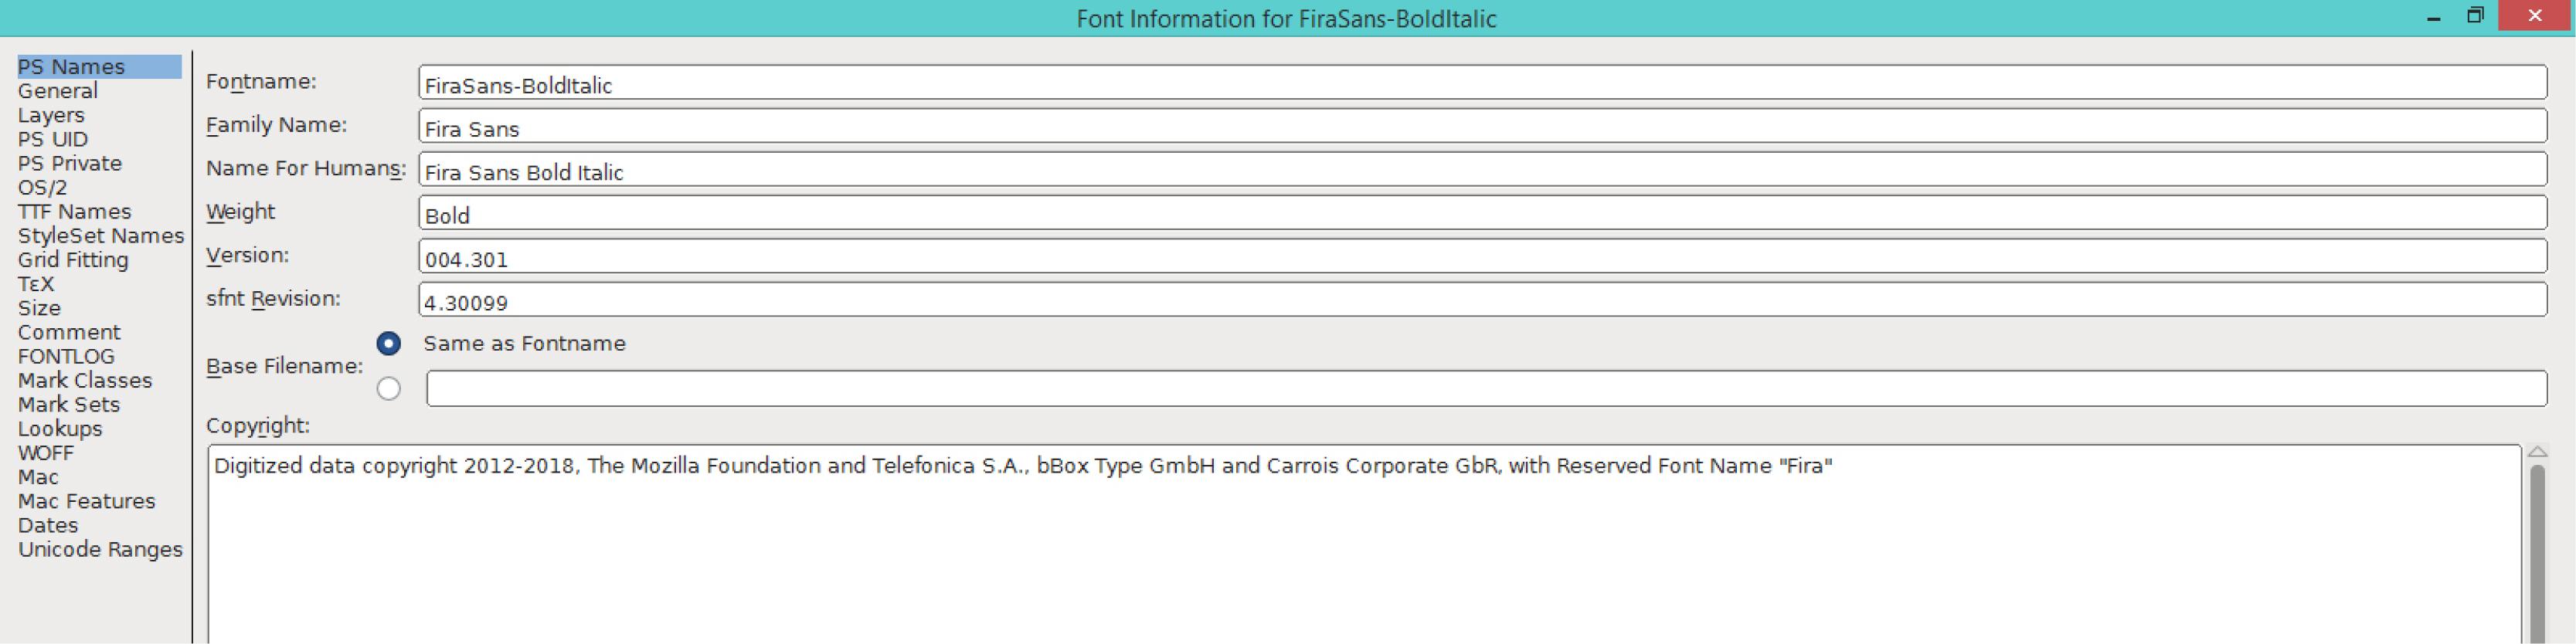 Fira Sans Bold Italic (PS)